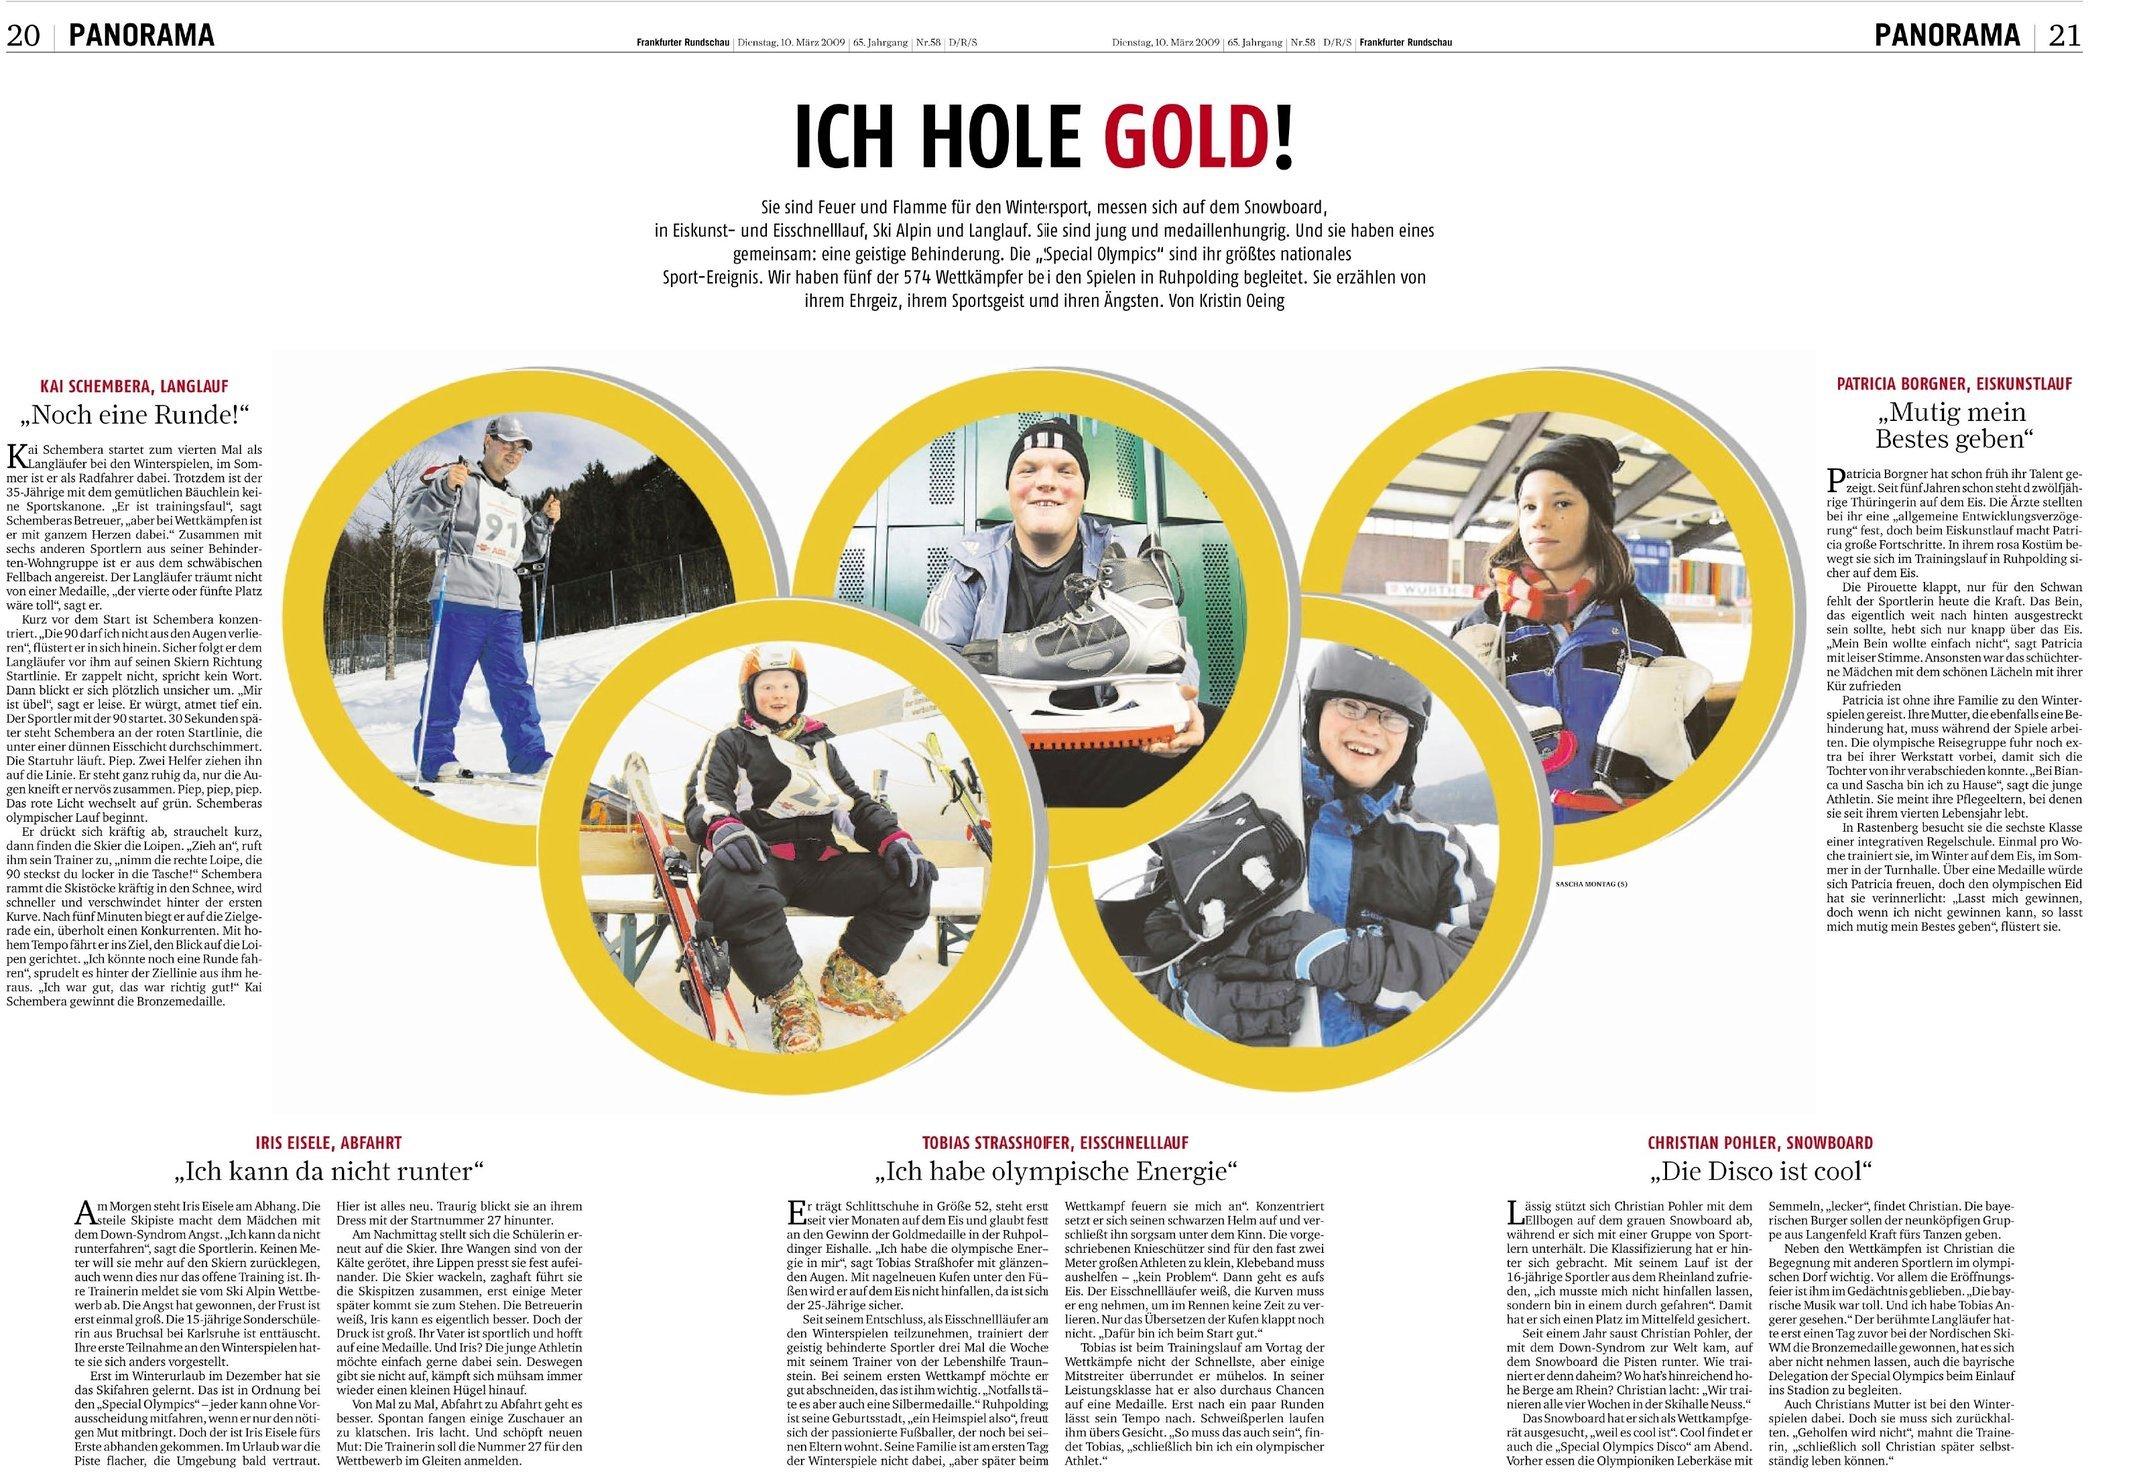 Frankfurter Rundschau 10.03.2009